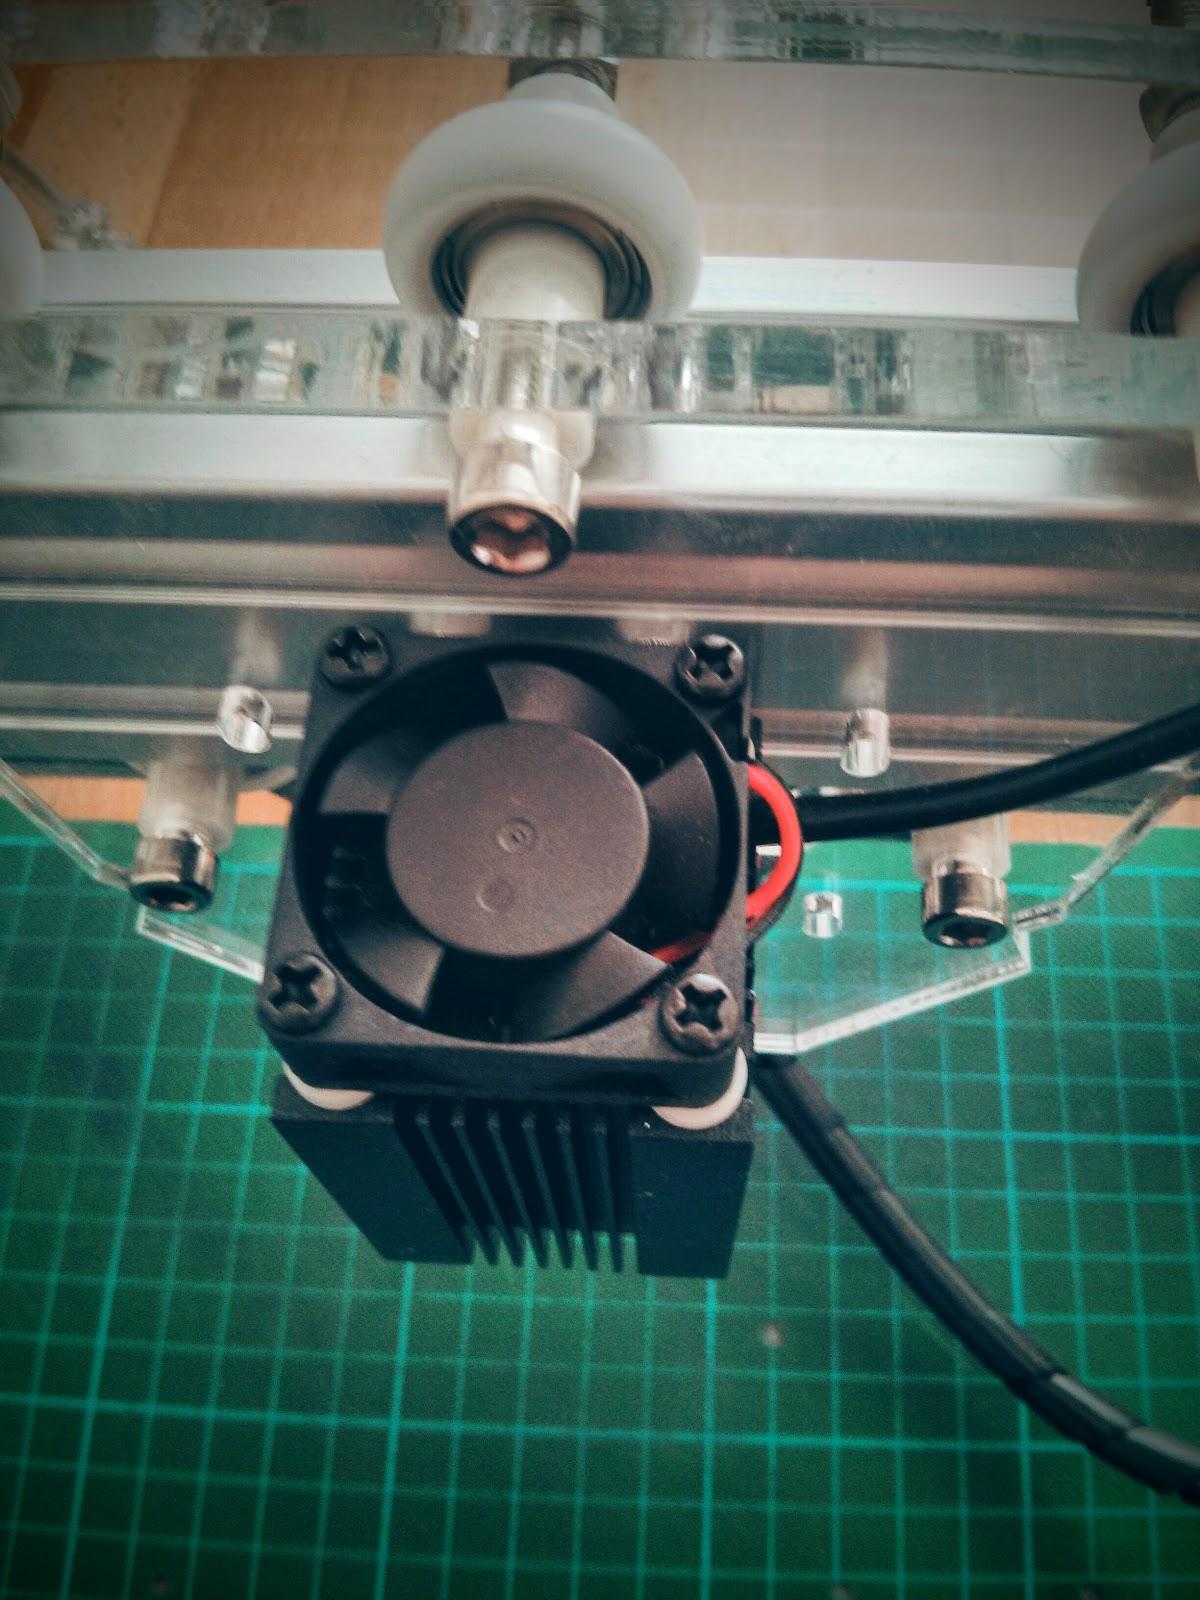 Blog Hoskins Banggood 2500mw Laser Engraver Setup Fan